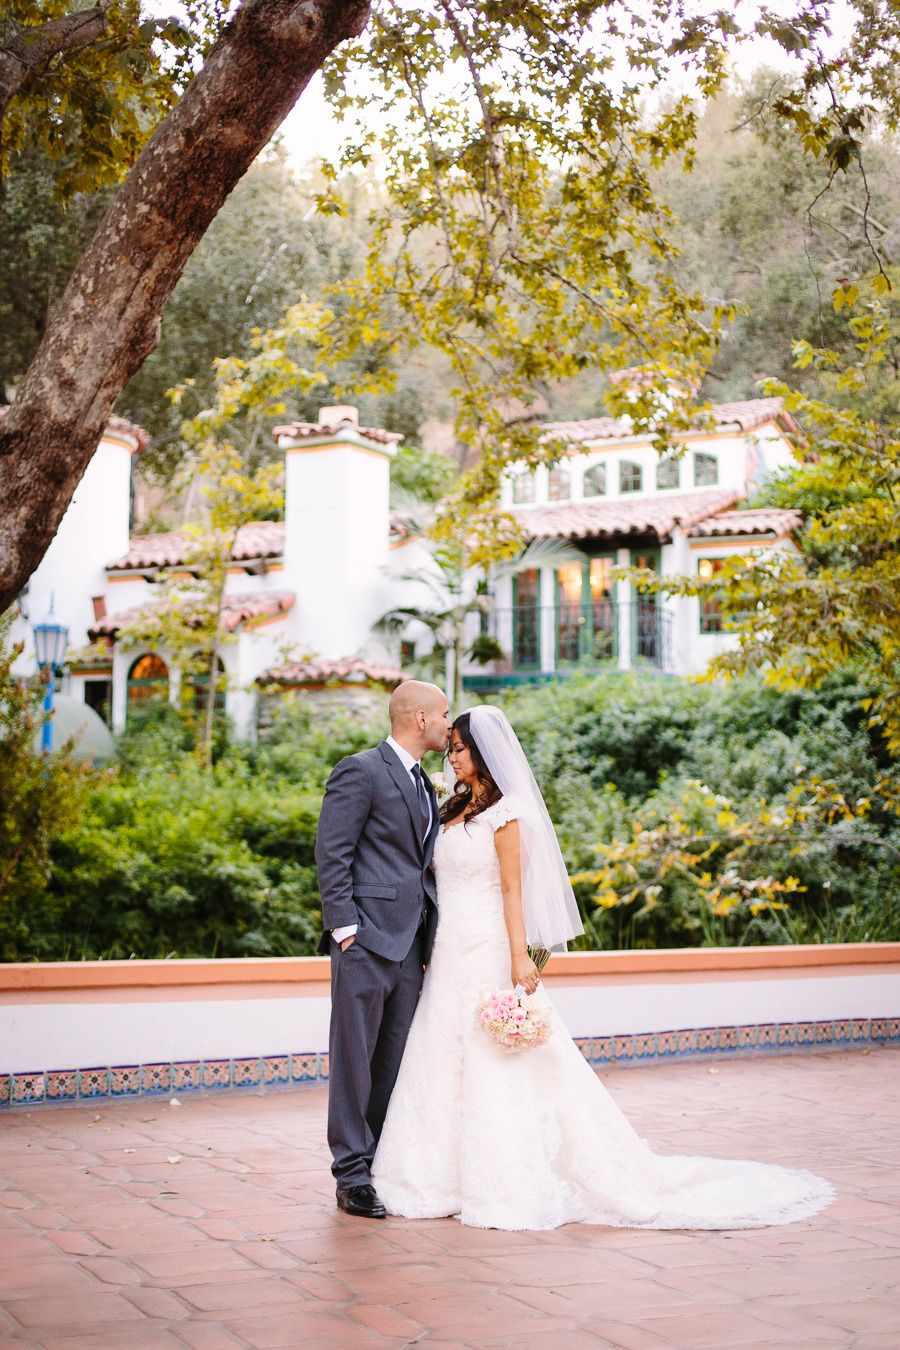 Heartfelt Wish Upon A Wedding Vow Renewal Wedding Most Beautiful Wedding Dresses Wedding Vows Renewal